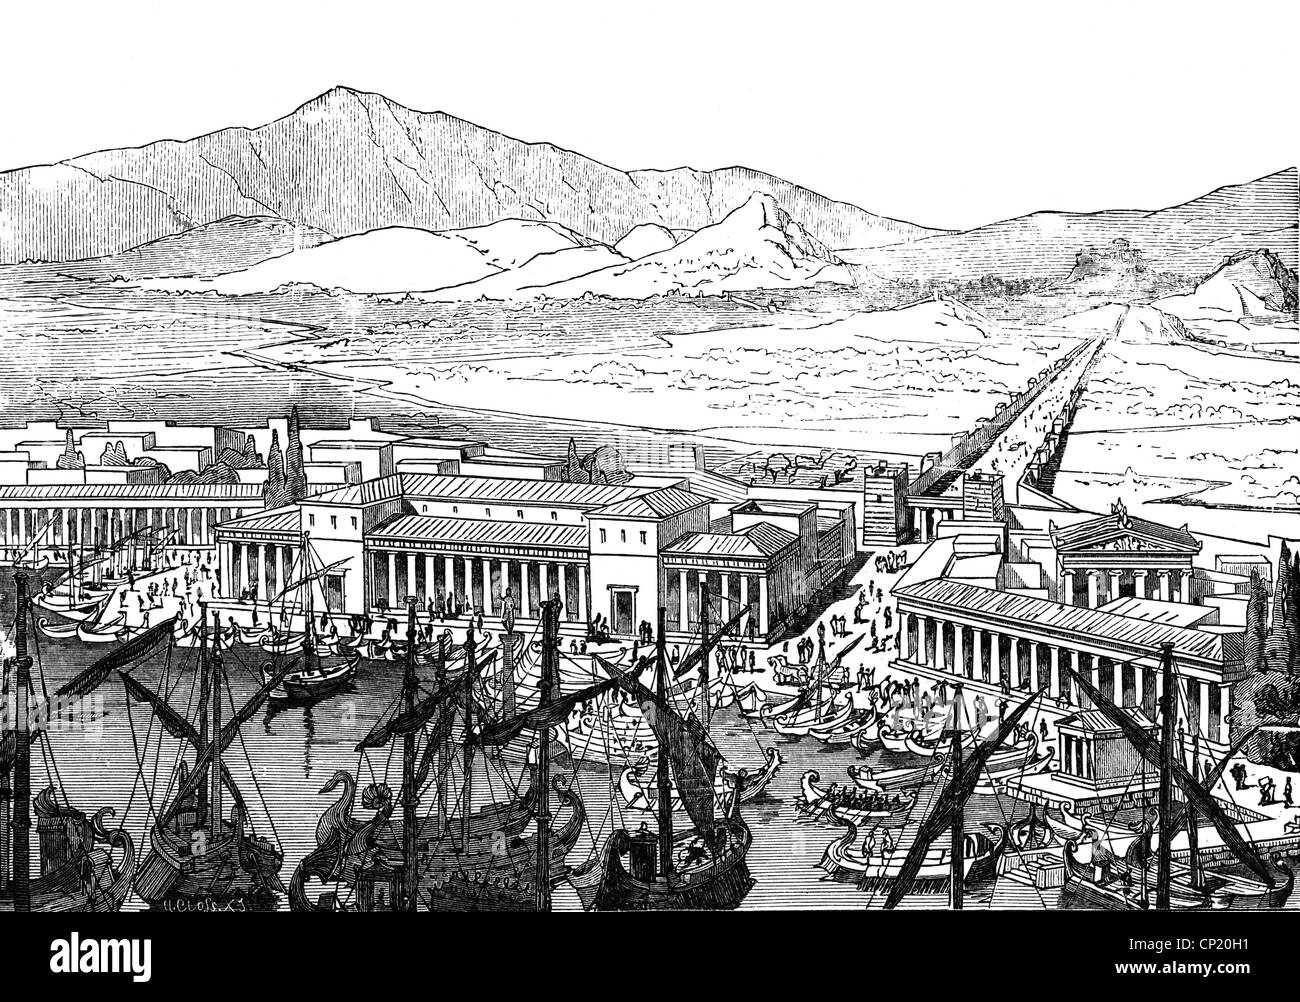 geography / travel, Greece, transport / transportation, navigation, view, harbour Piraeus, 5th/4th century BC, reconstruction, - Stock Image